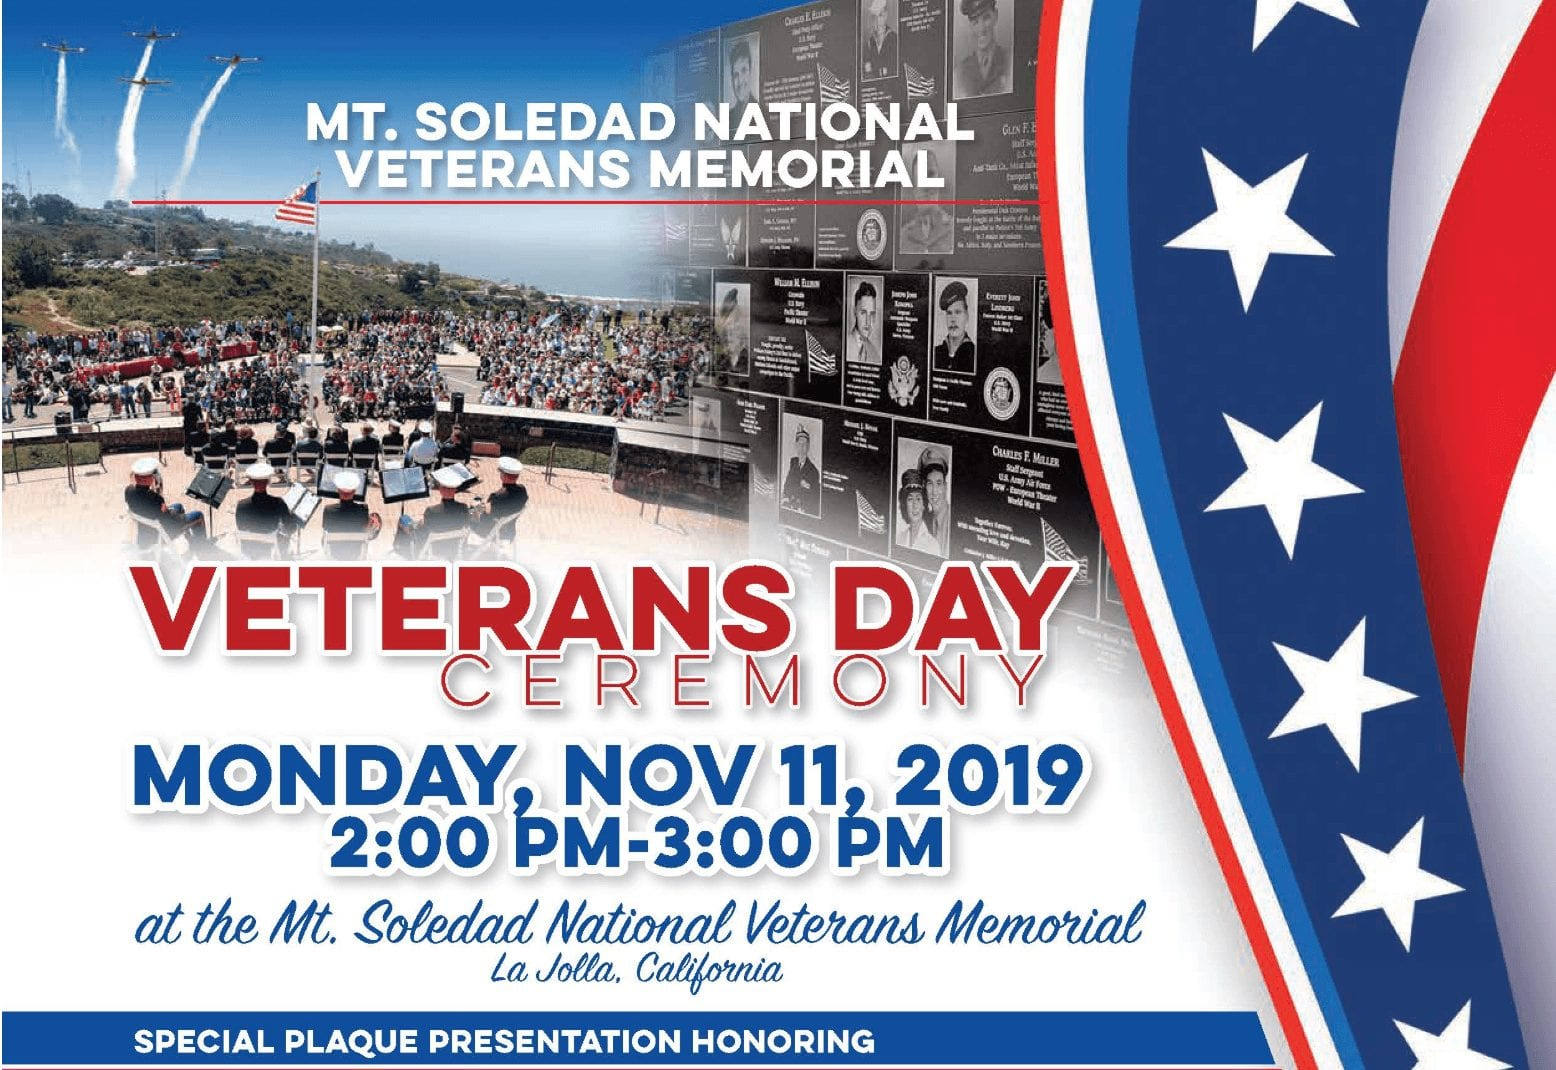 Veterans Day 2019 Mt. Soledad